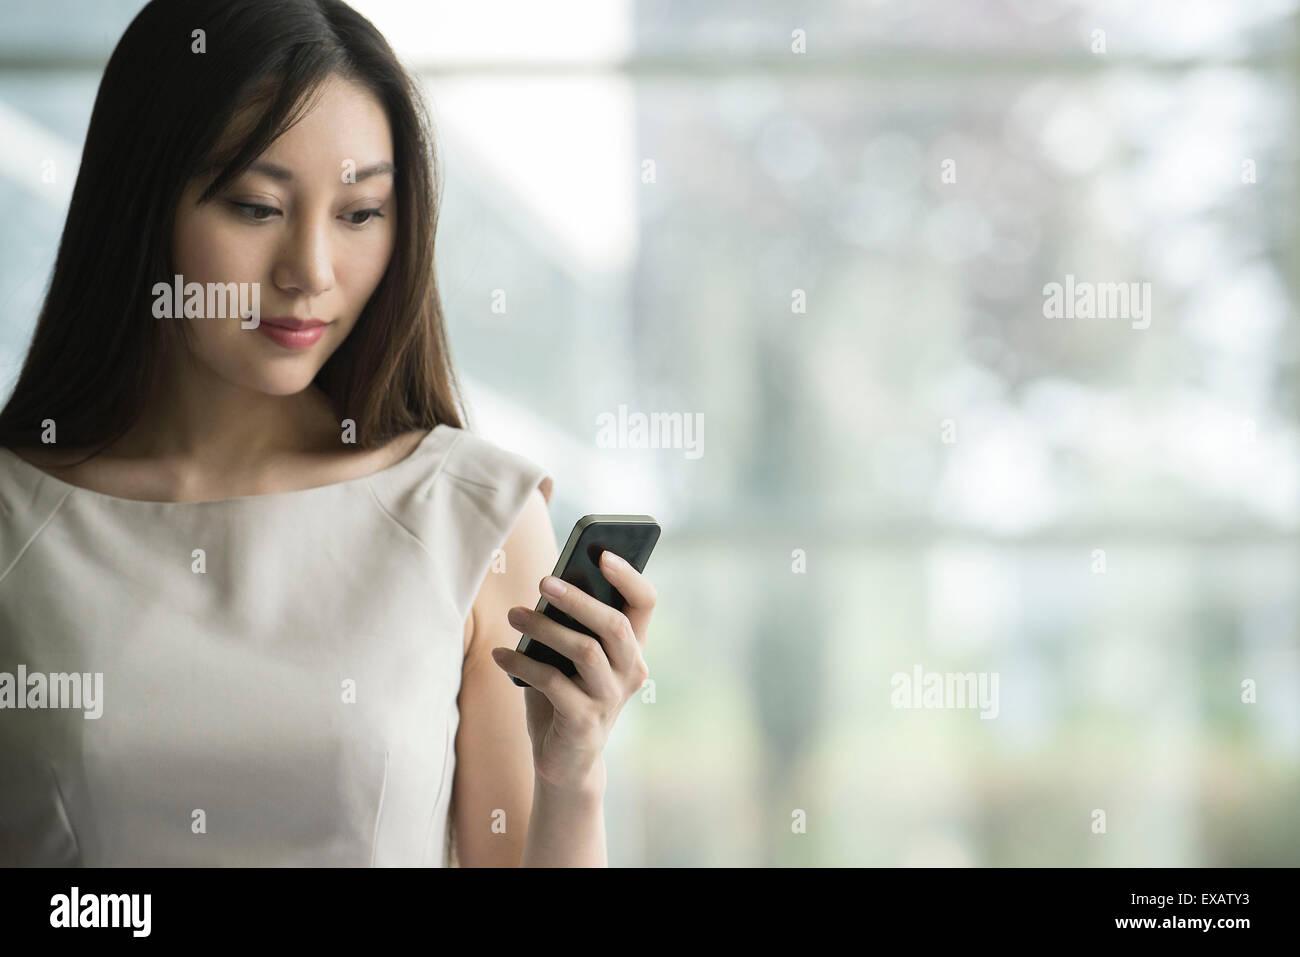 Businesswoman using smartphone - Stock Image